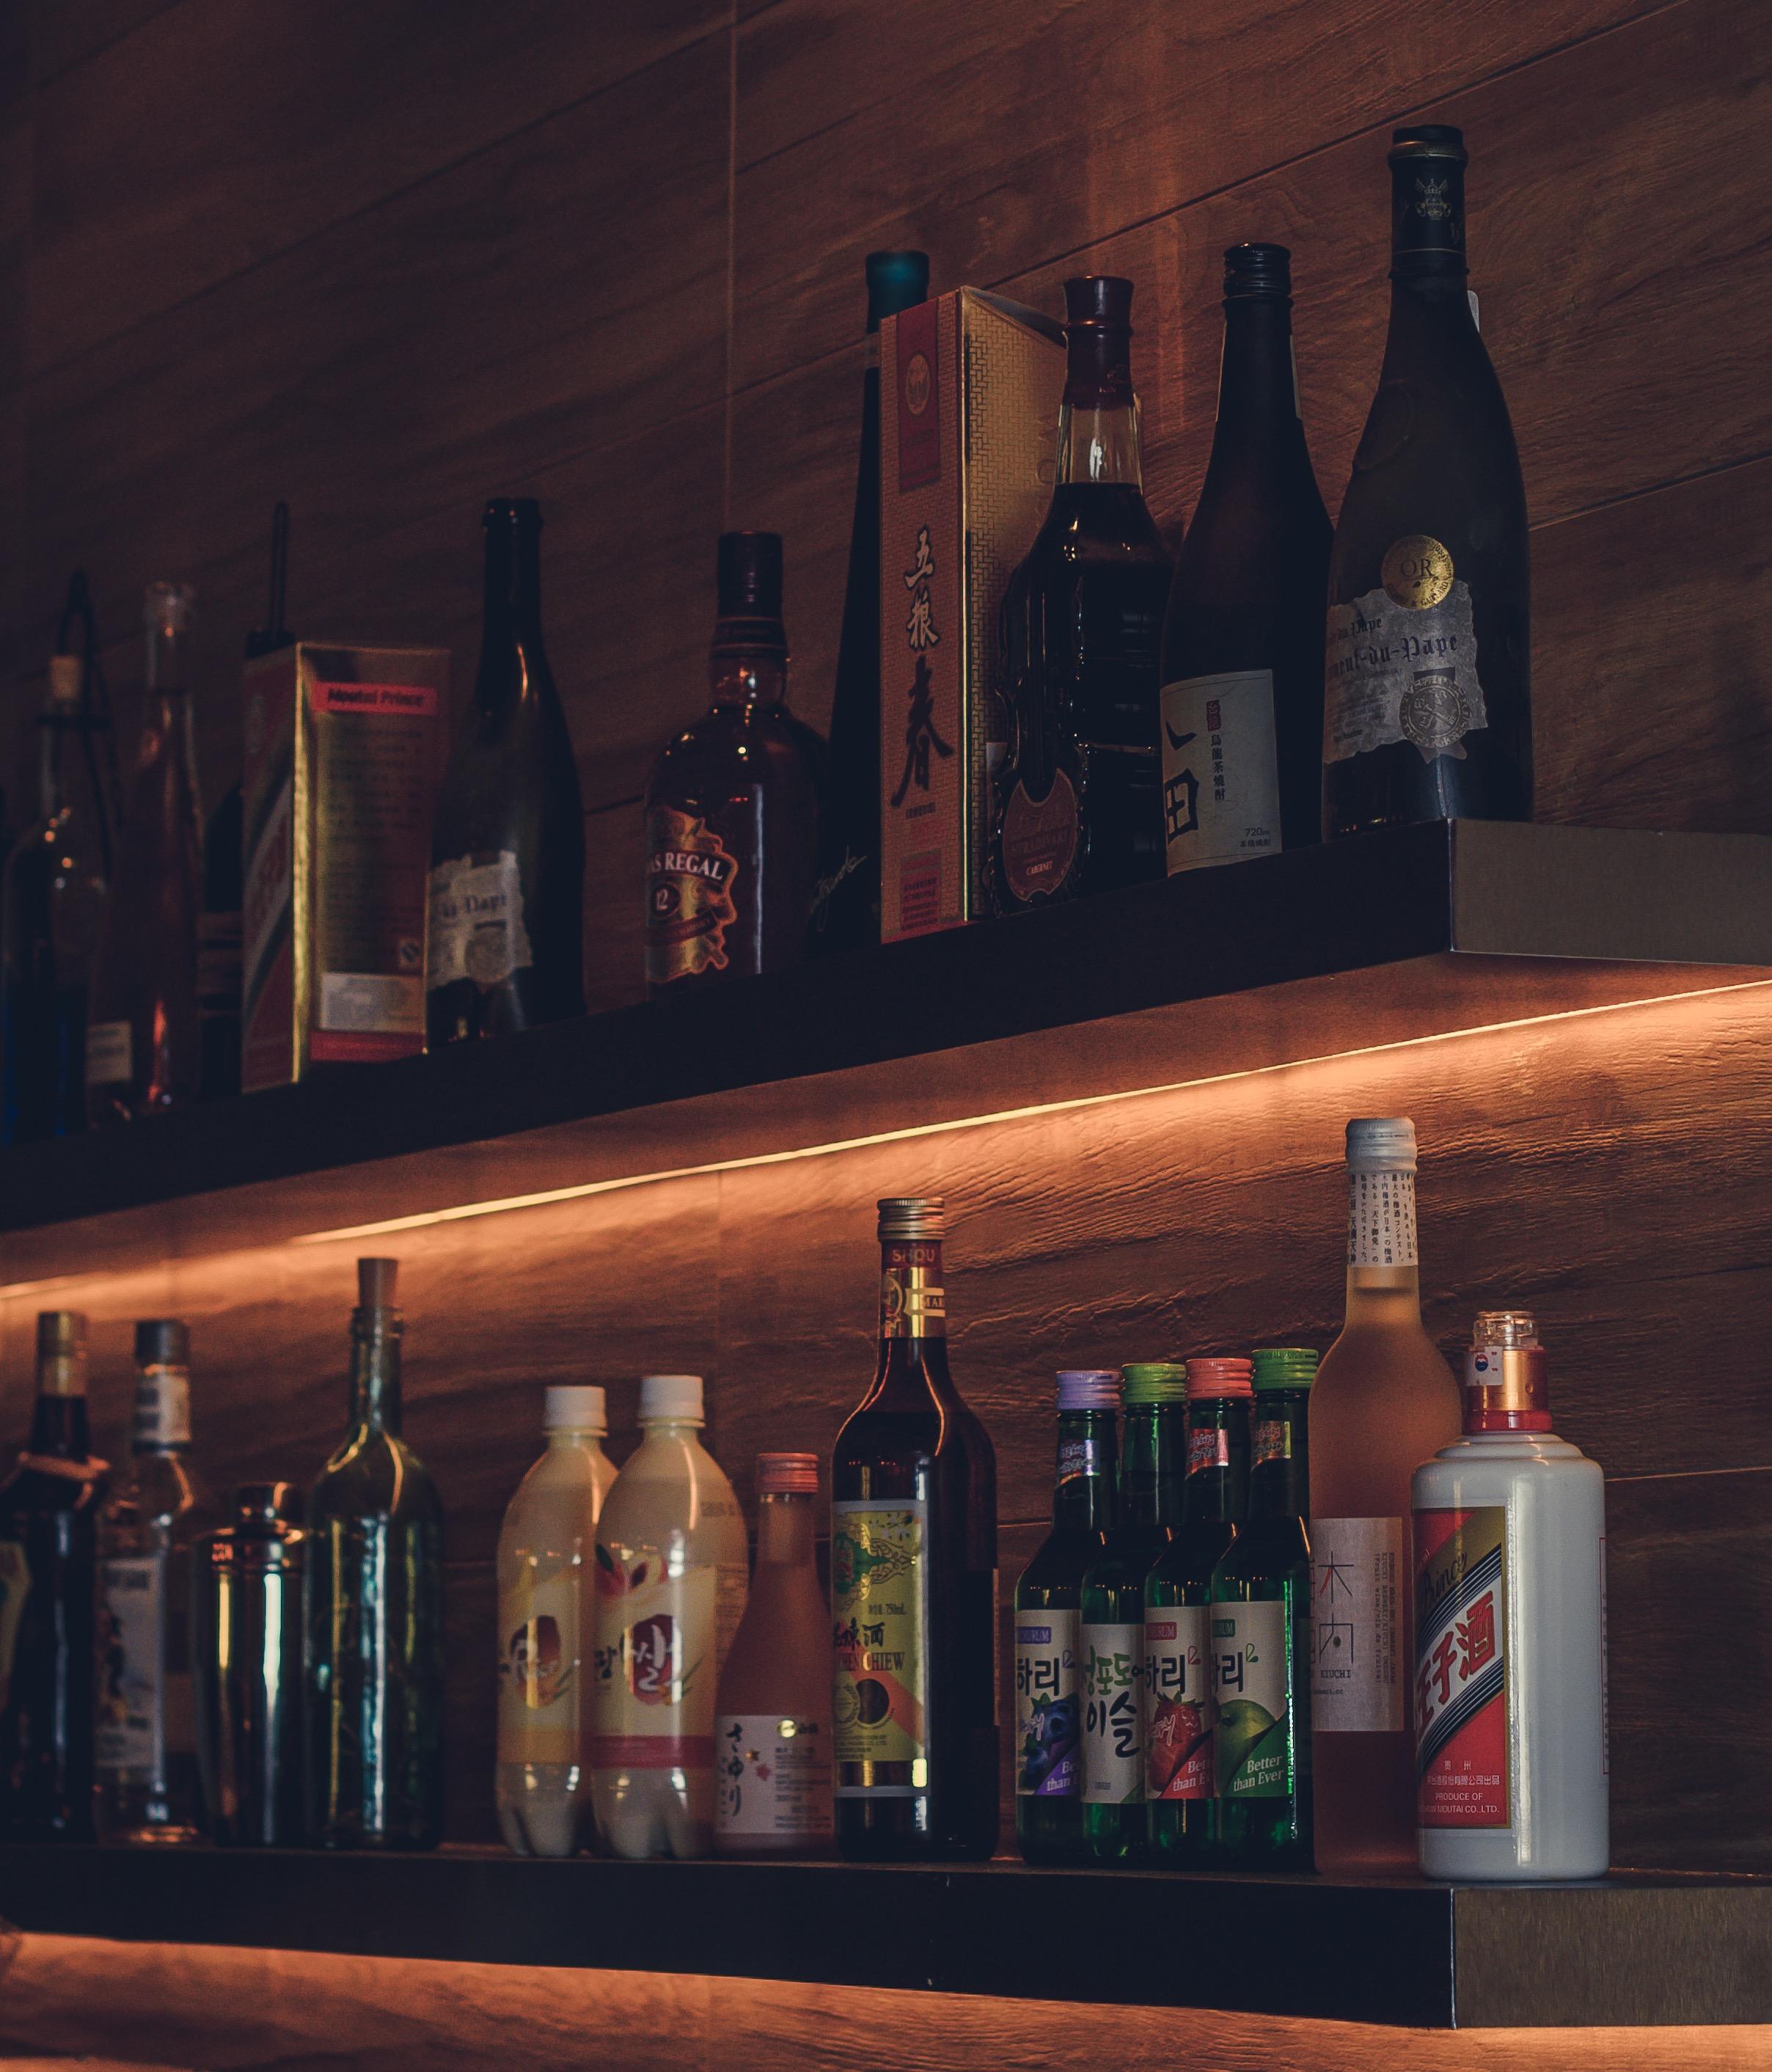 Sian City Bar